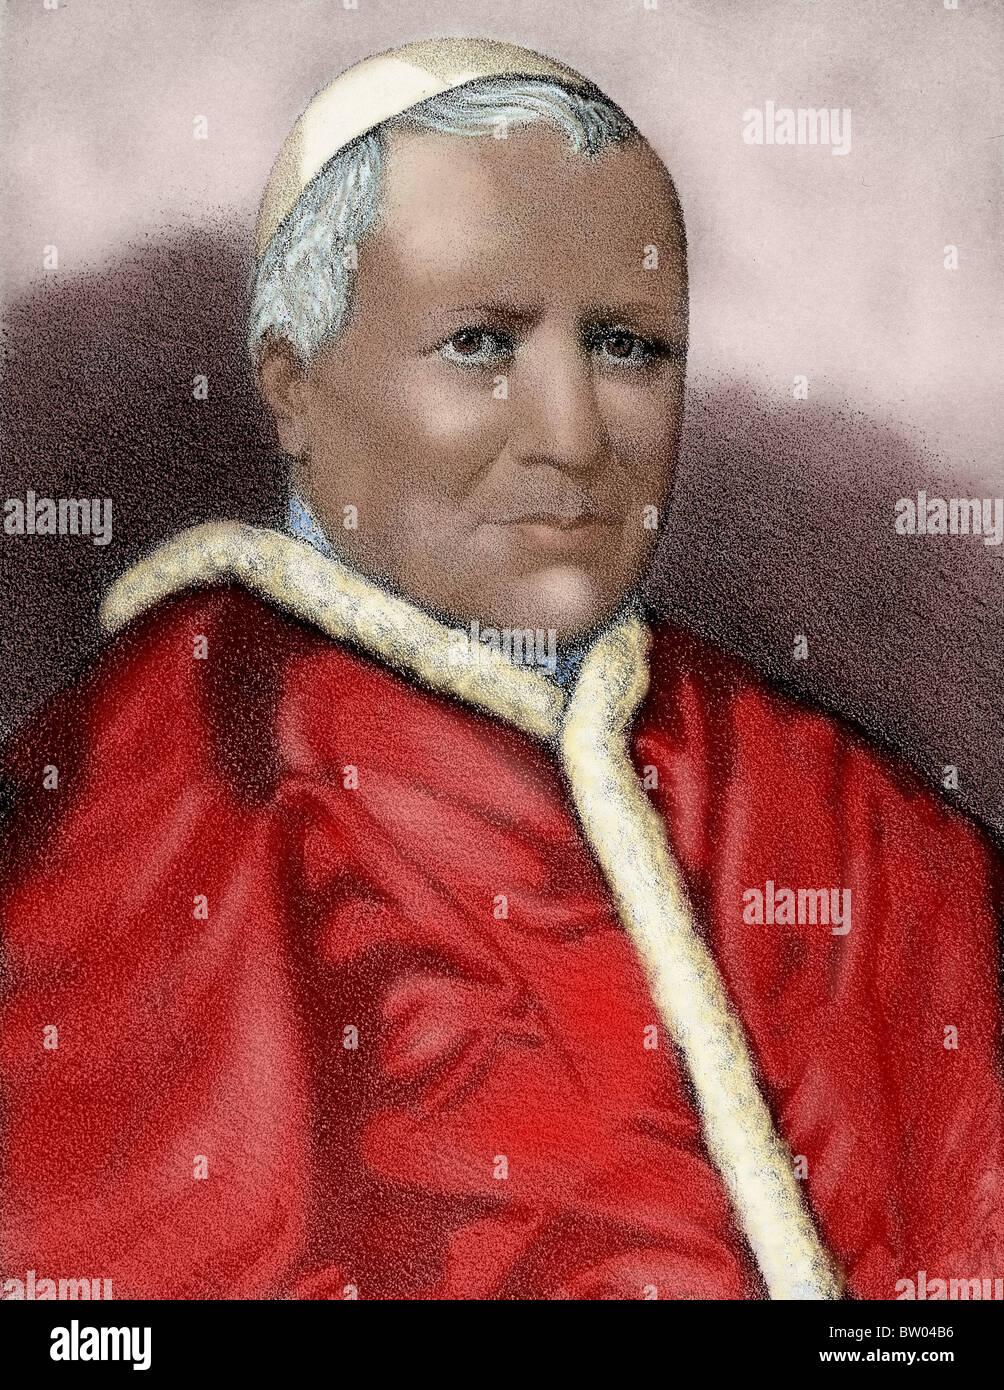 Pius IX (1792-1878). Italian pope. Stock Photo